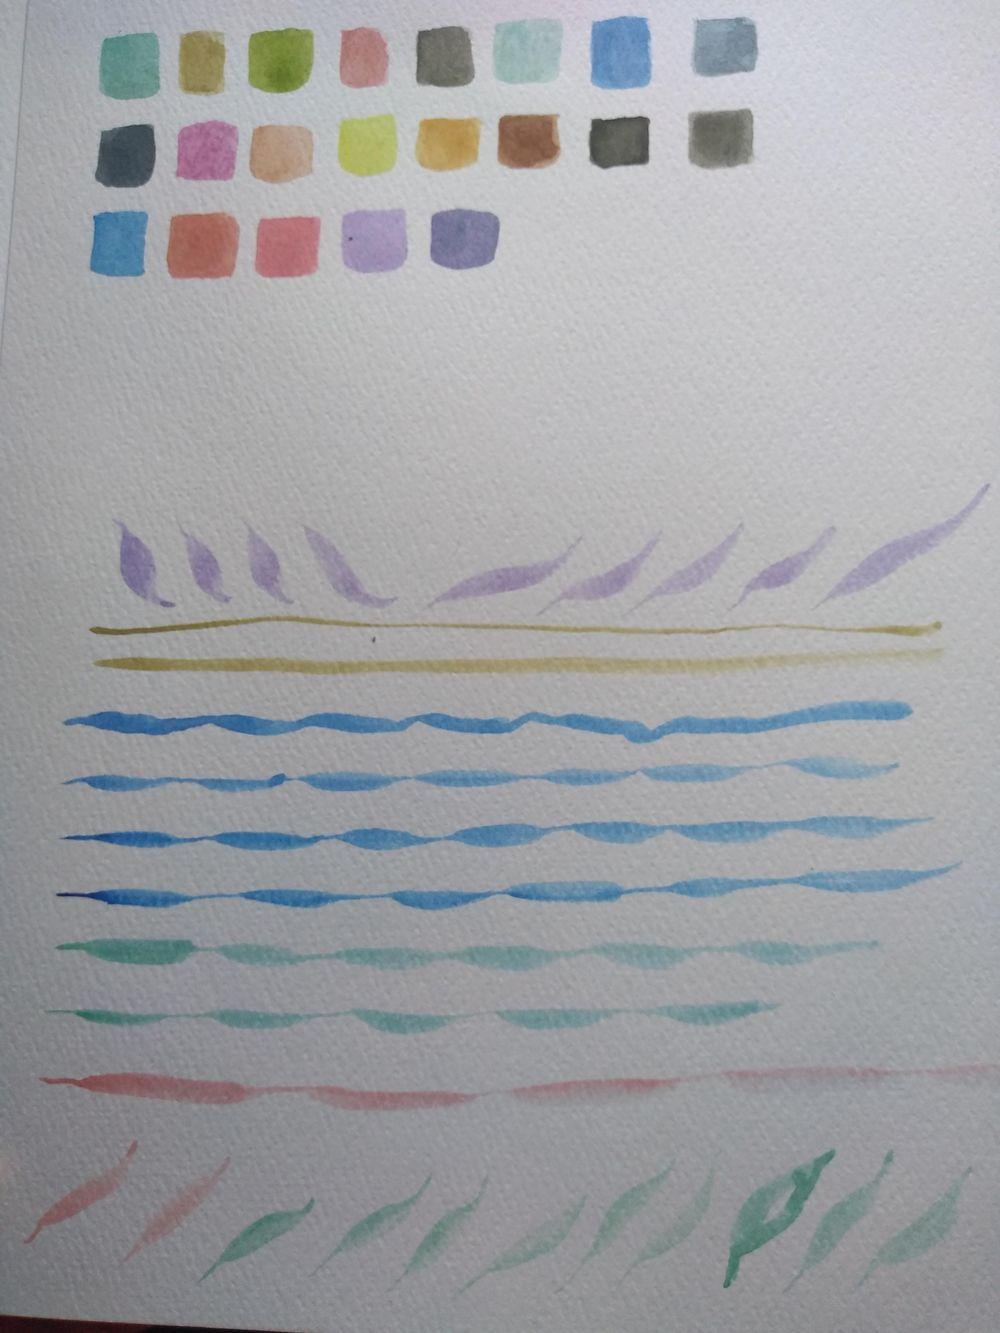 Las ramitas de mi vida - image 2 - student project